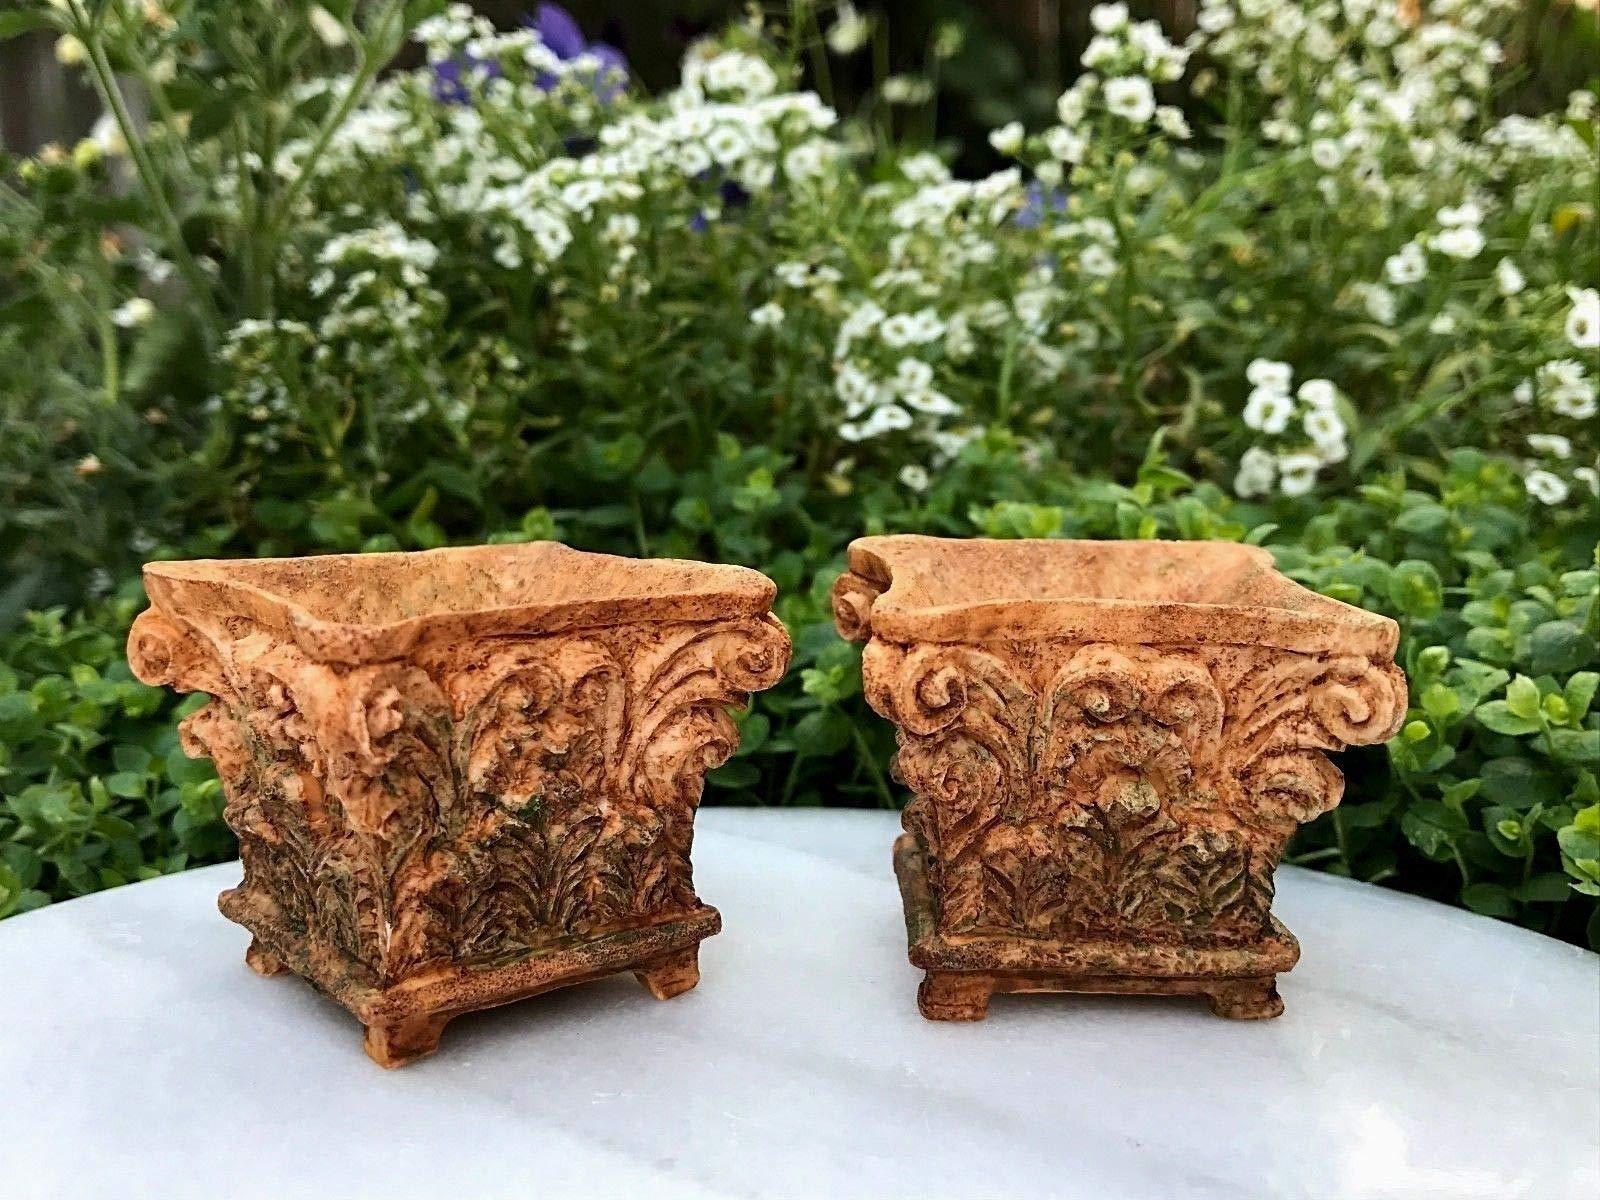 Adjore Miniature Dollhouse Fairy Garden ~ 2 Large Aged Corinthian Planter Pots ~ New ~ Best Outdoor Accessory